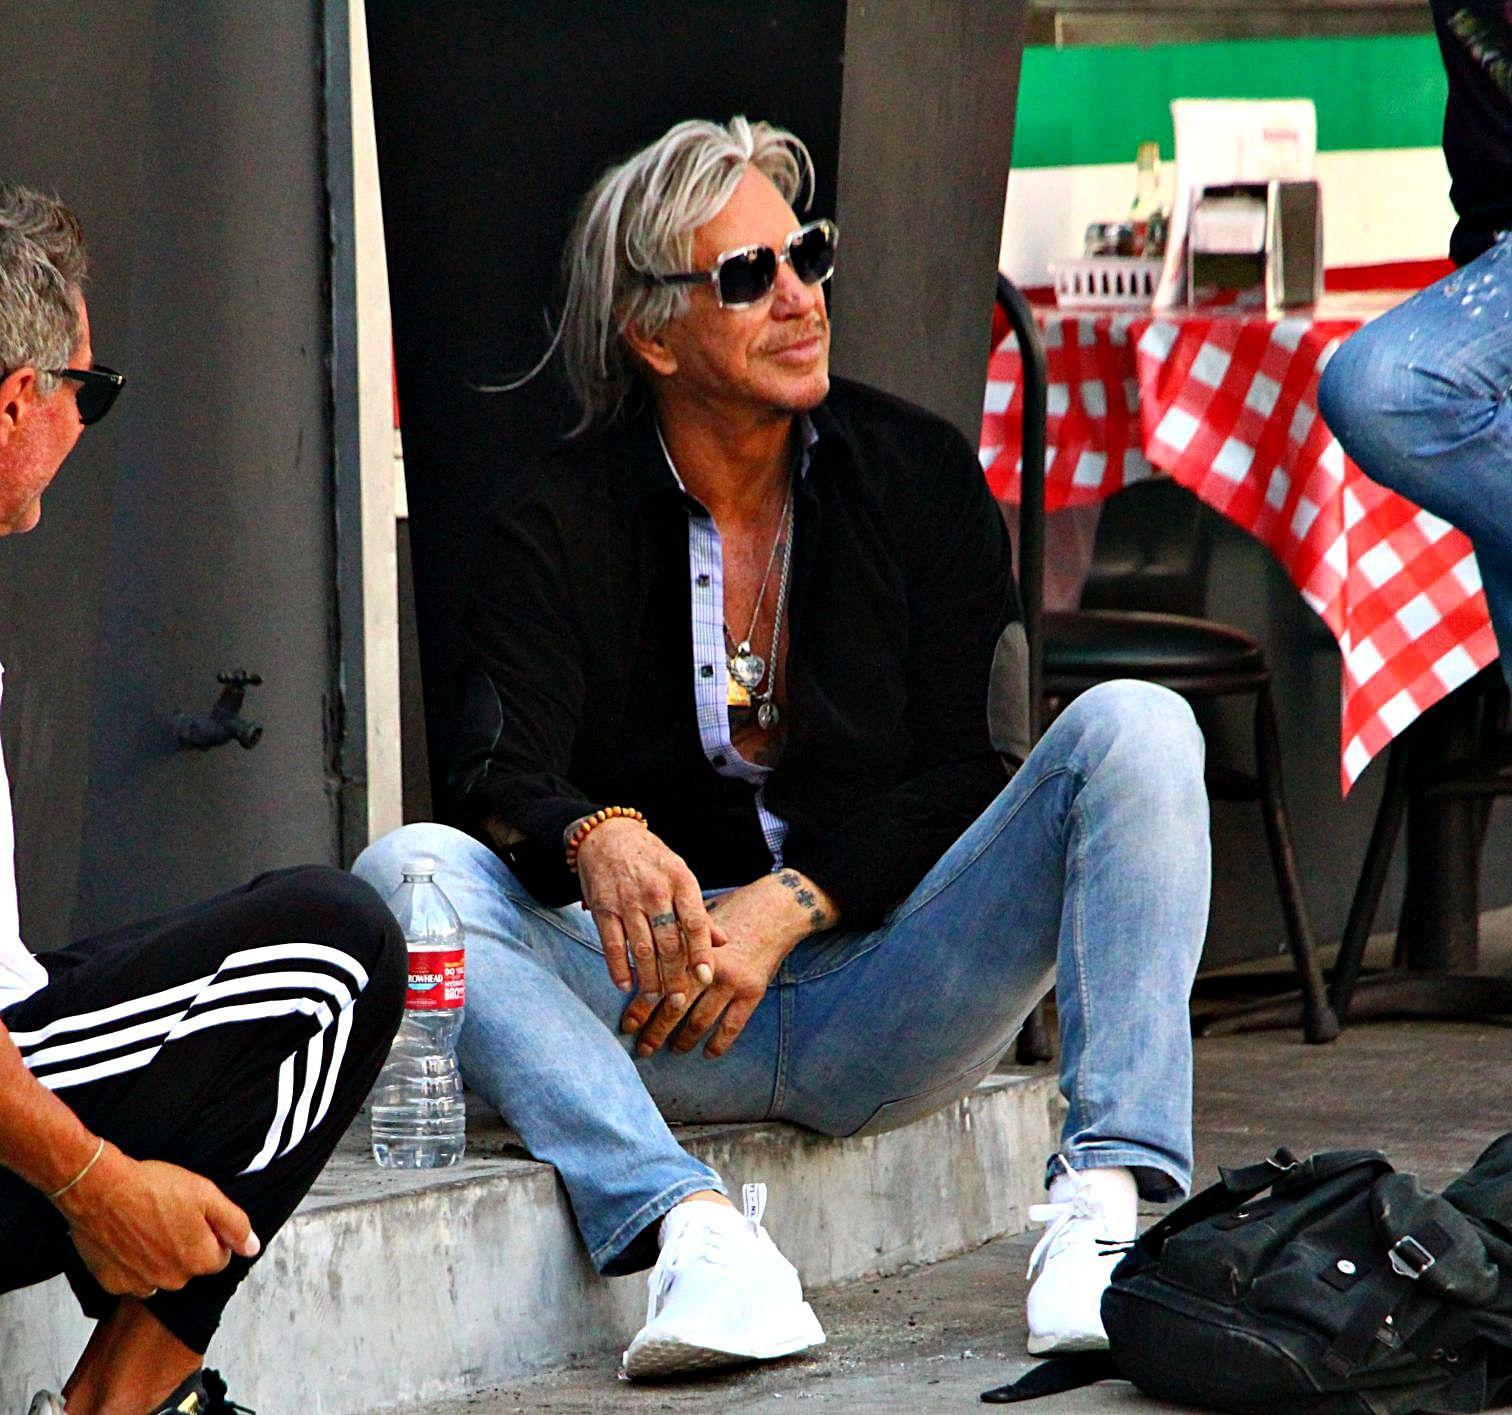 Mickey Rourke Seen Sitting On Sidewalk Talking to Pals